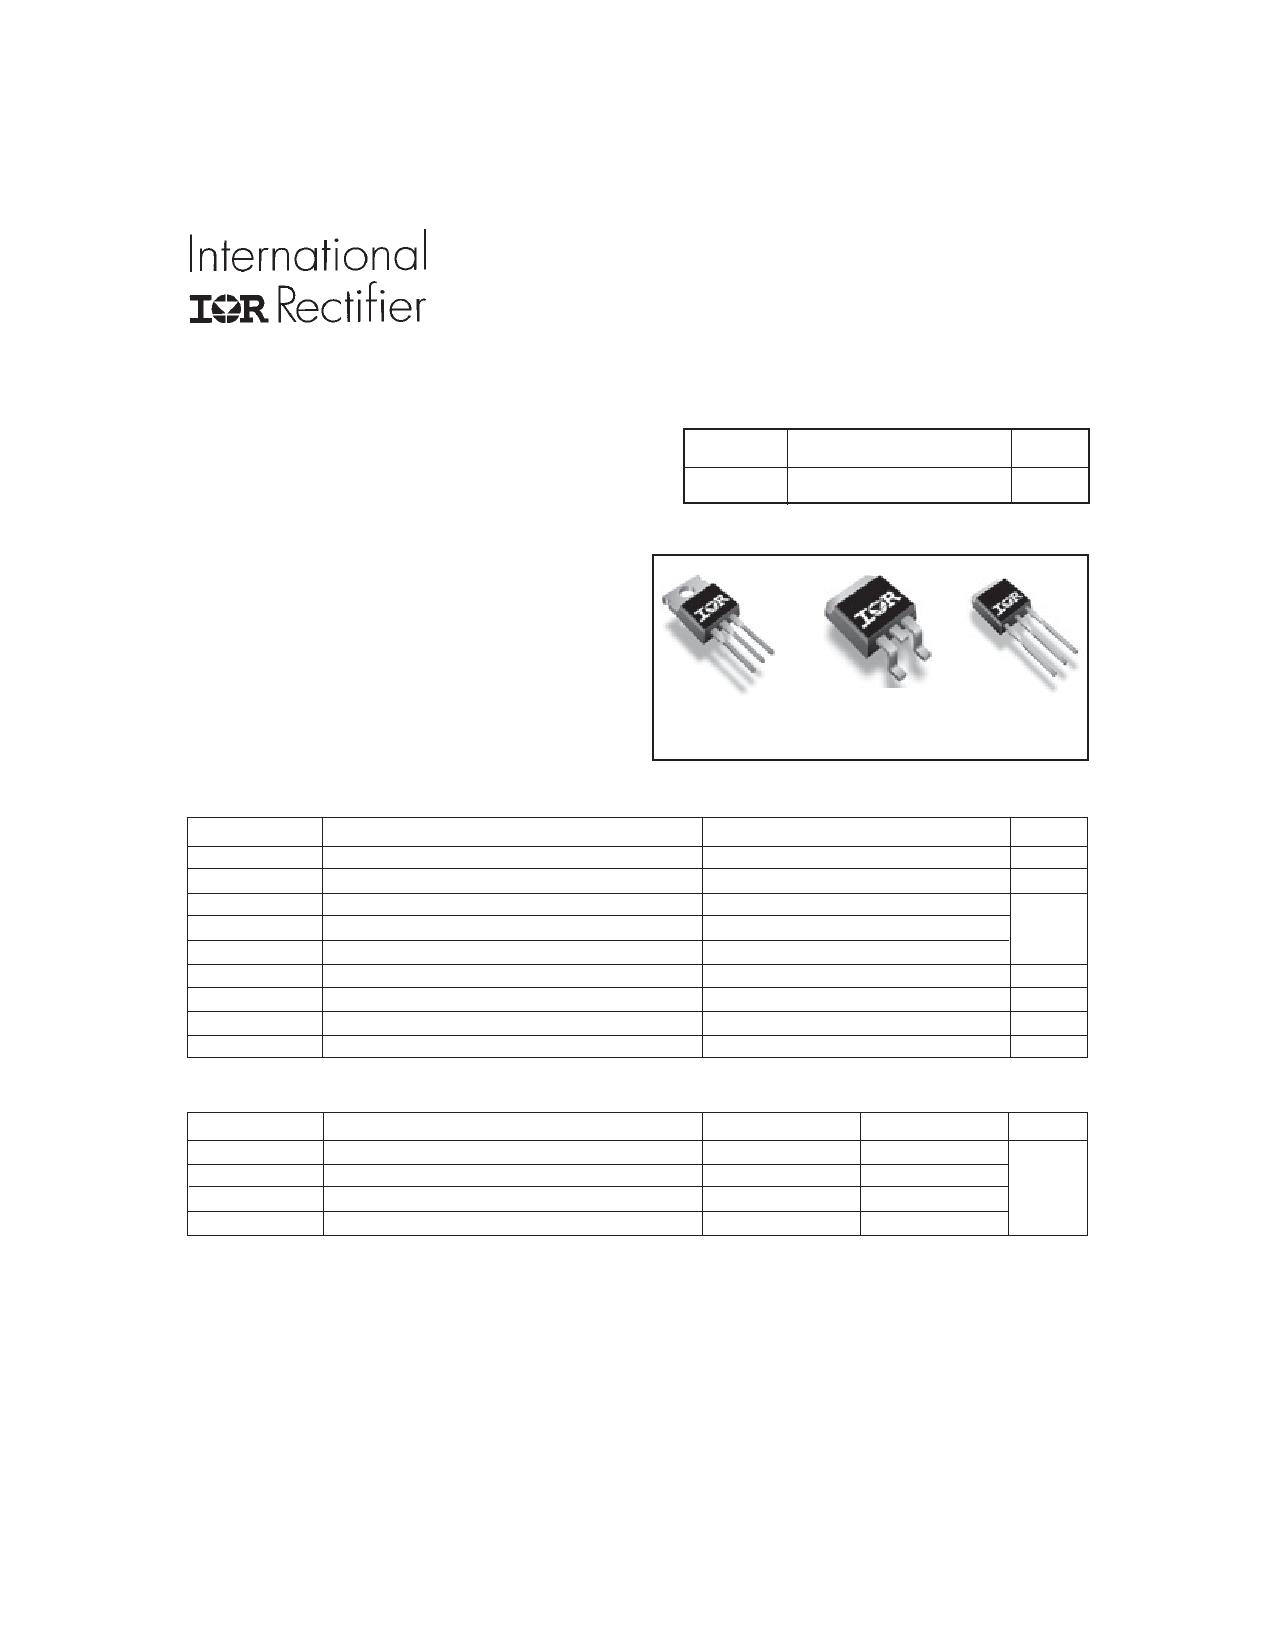 IRL3716LPbF Datasheet, IRL3716LPbF PDF,ピン配置, 機能